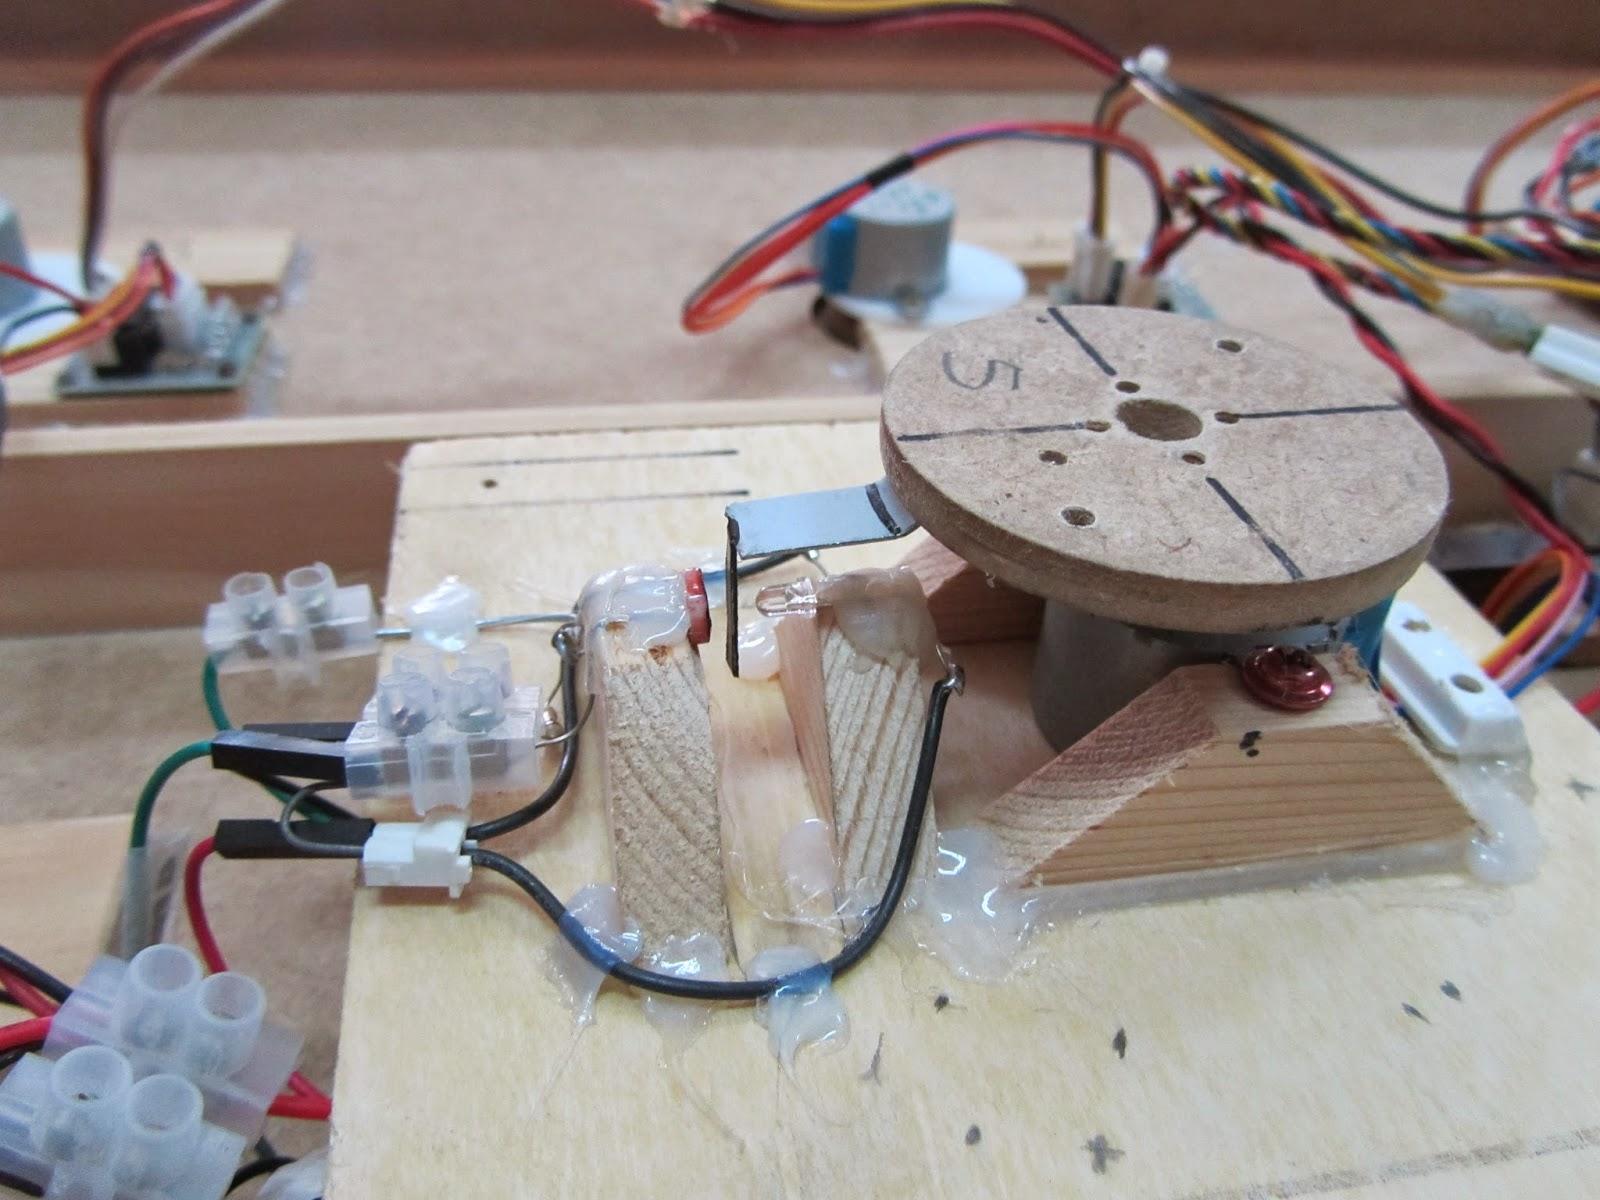 Experimentos artísticos con arduino pd processing vpt